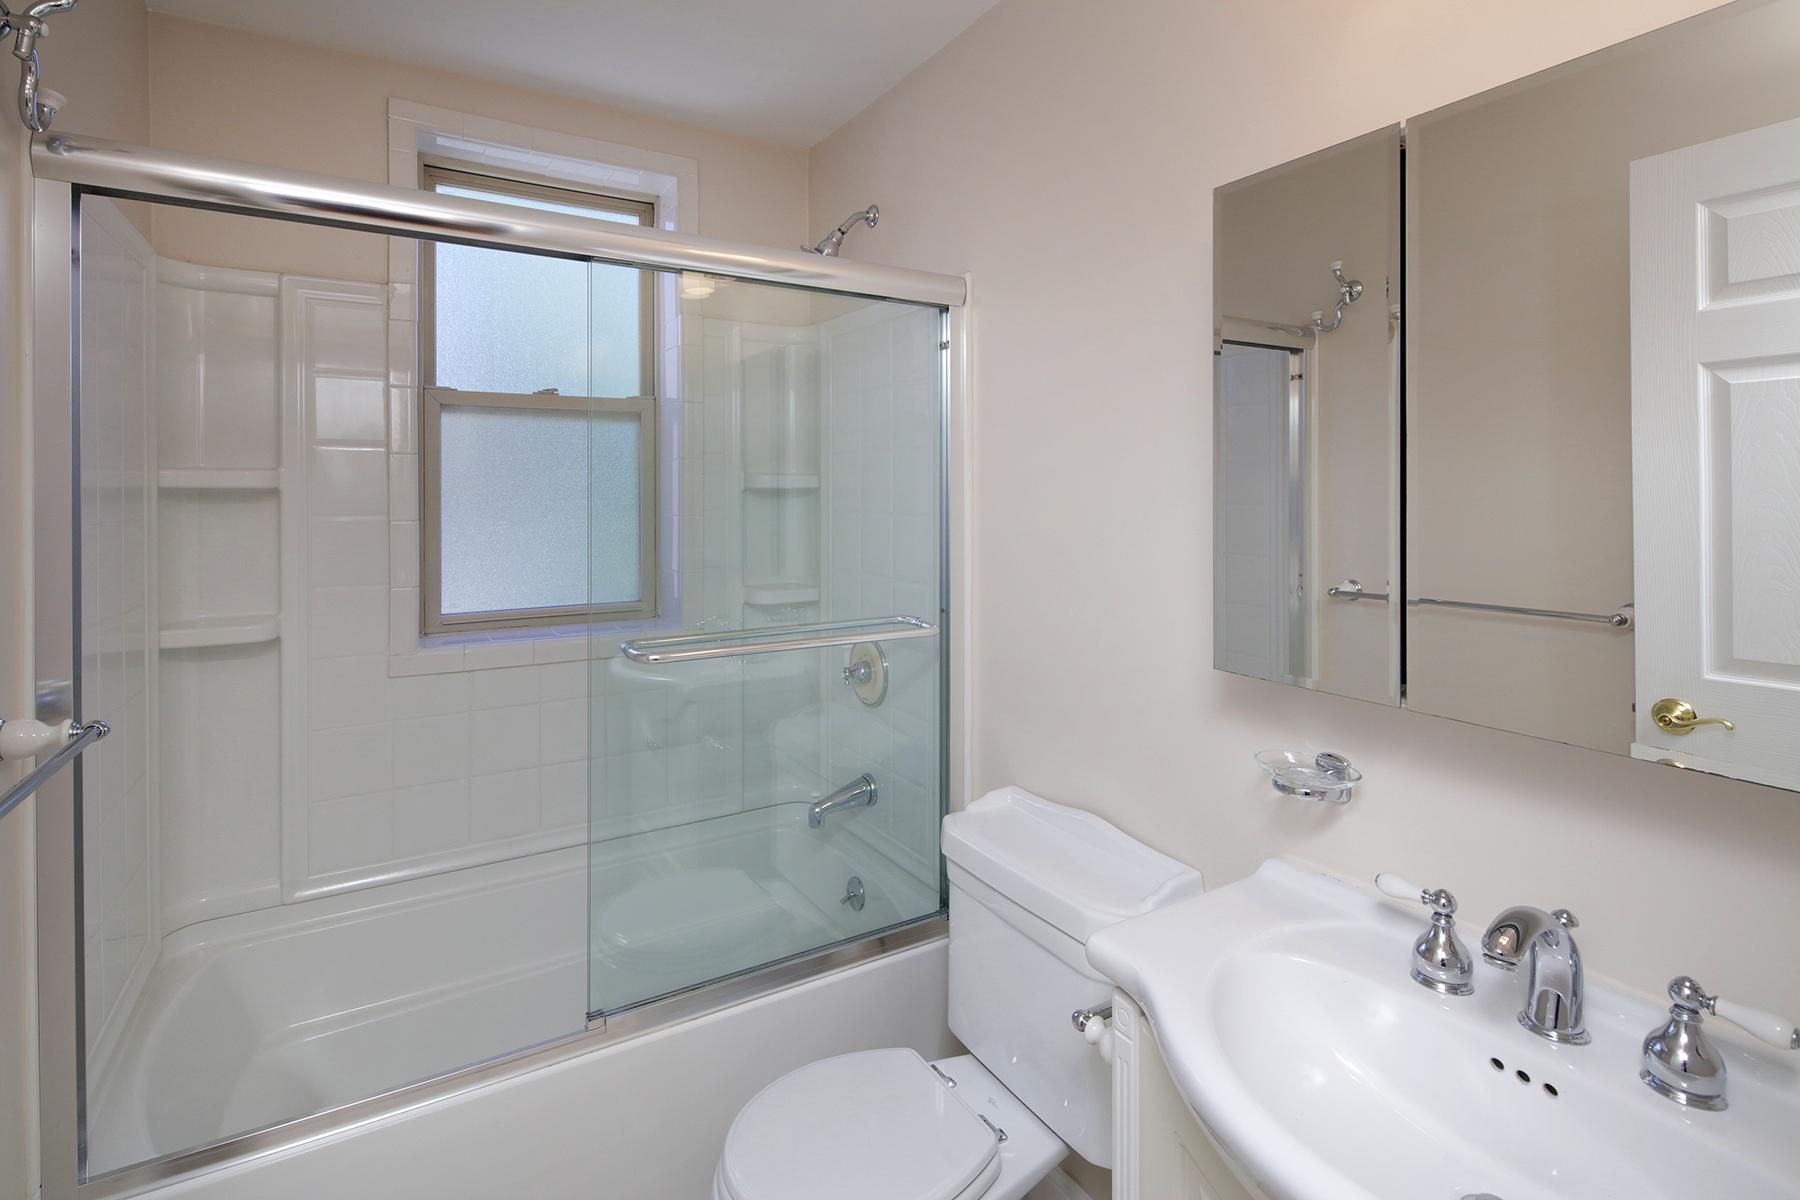 1 Bed Small Bath